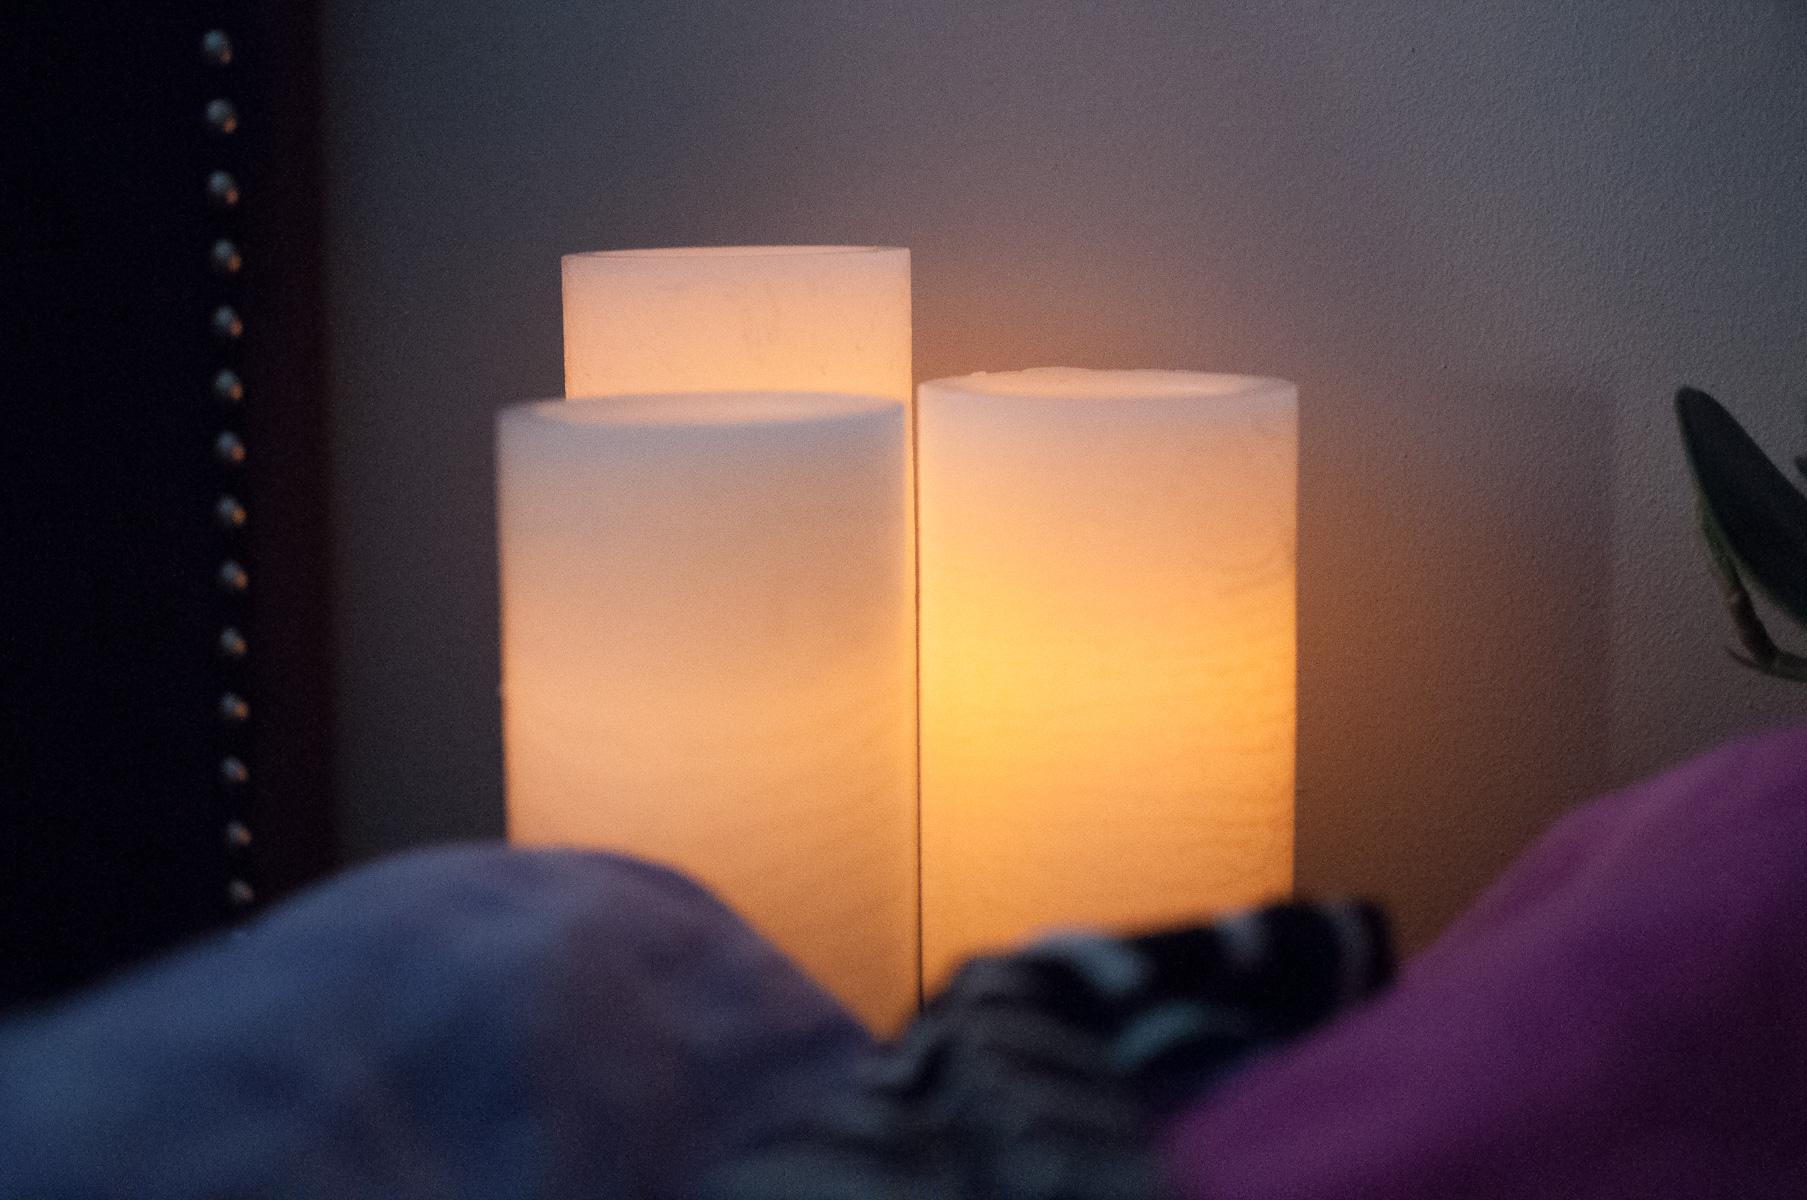 glowing-candles.jpg